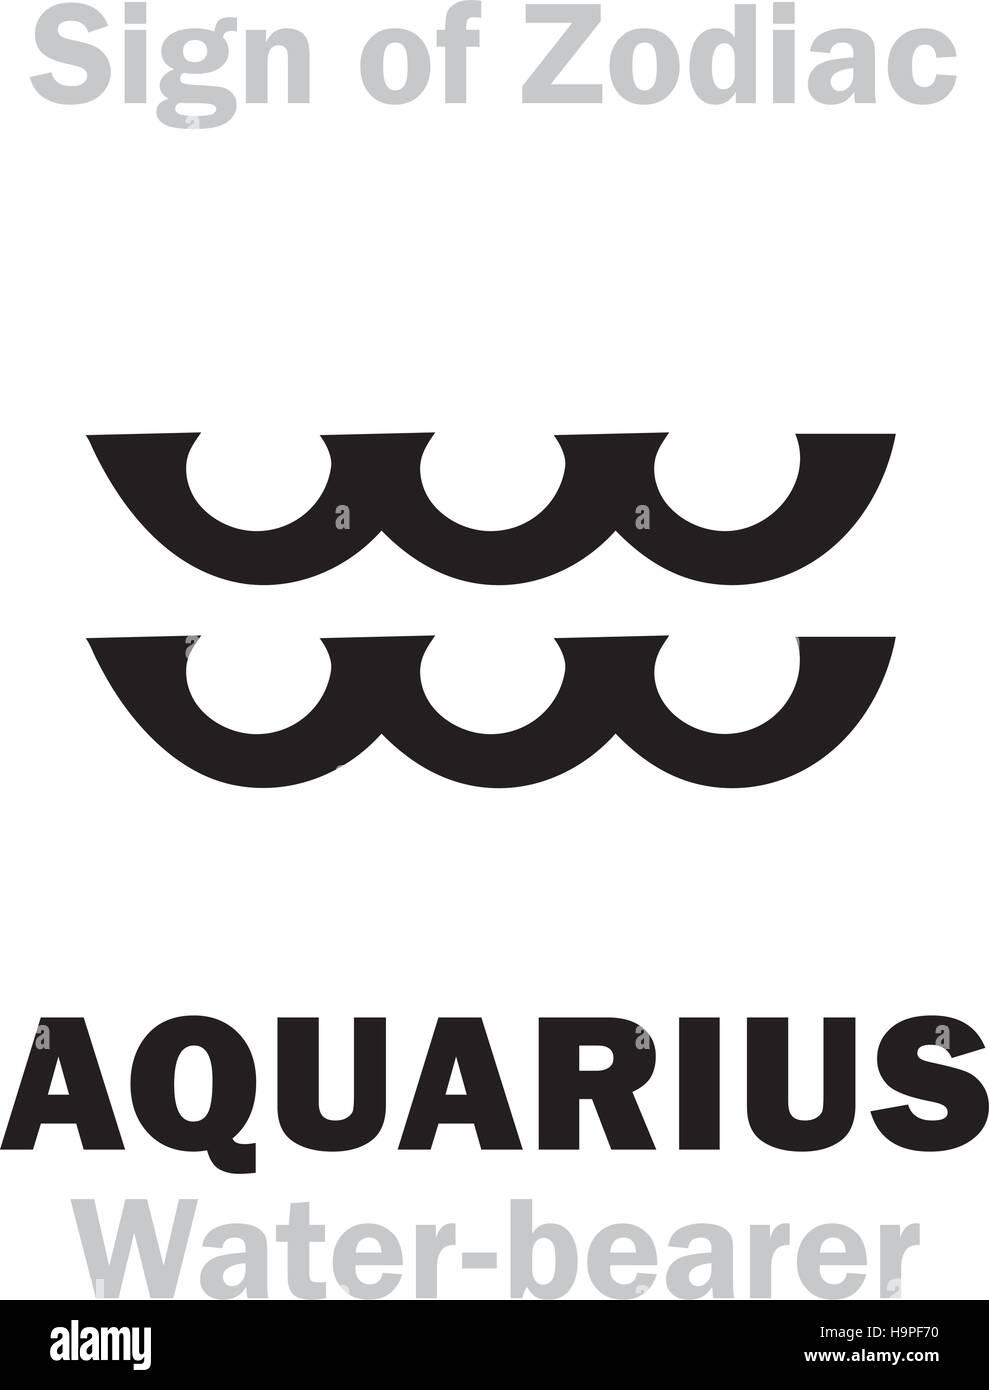 Astrology alphabet sign of zodiac aquarius the water bearer astrology alphabet sign of zodiac aquarius the water bearer hieroglyphics character sign single symbol biocorpaavc Choice Image